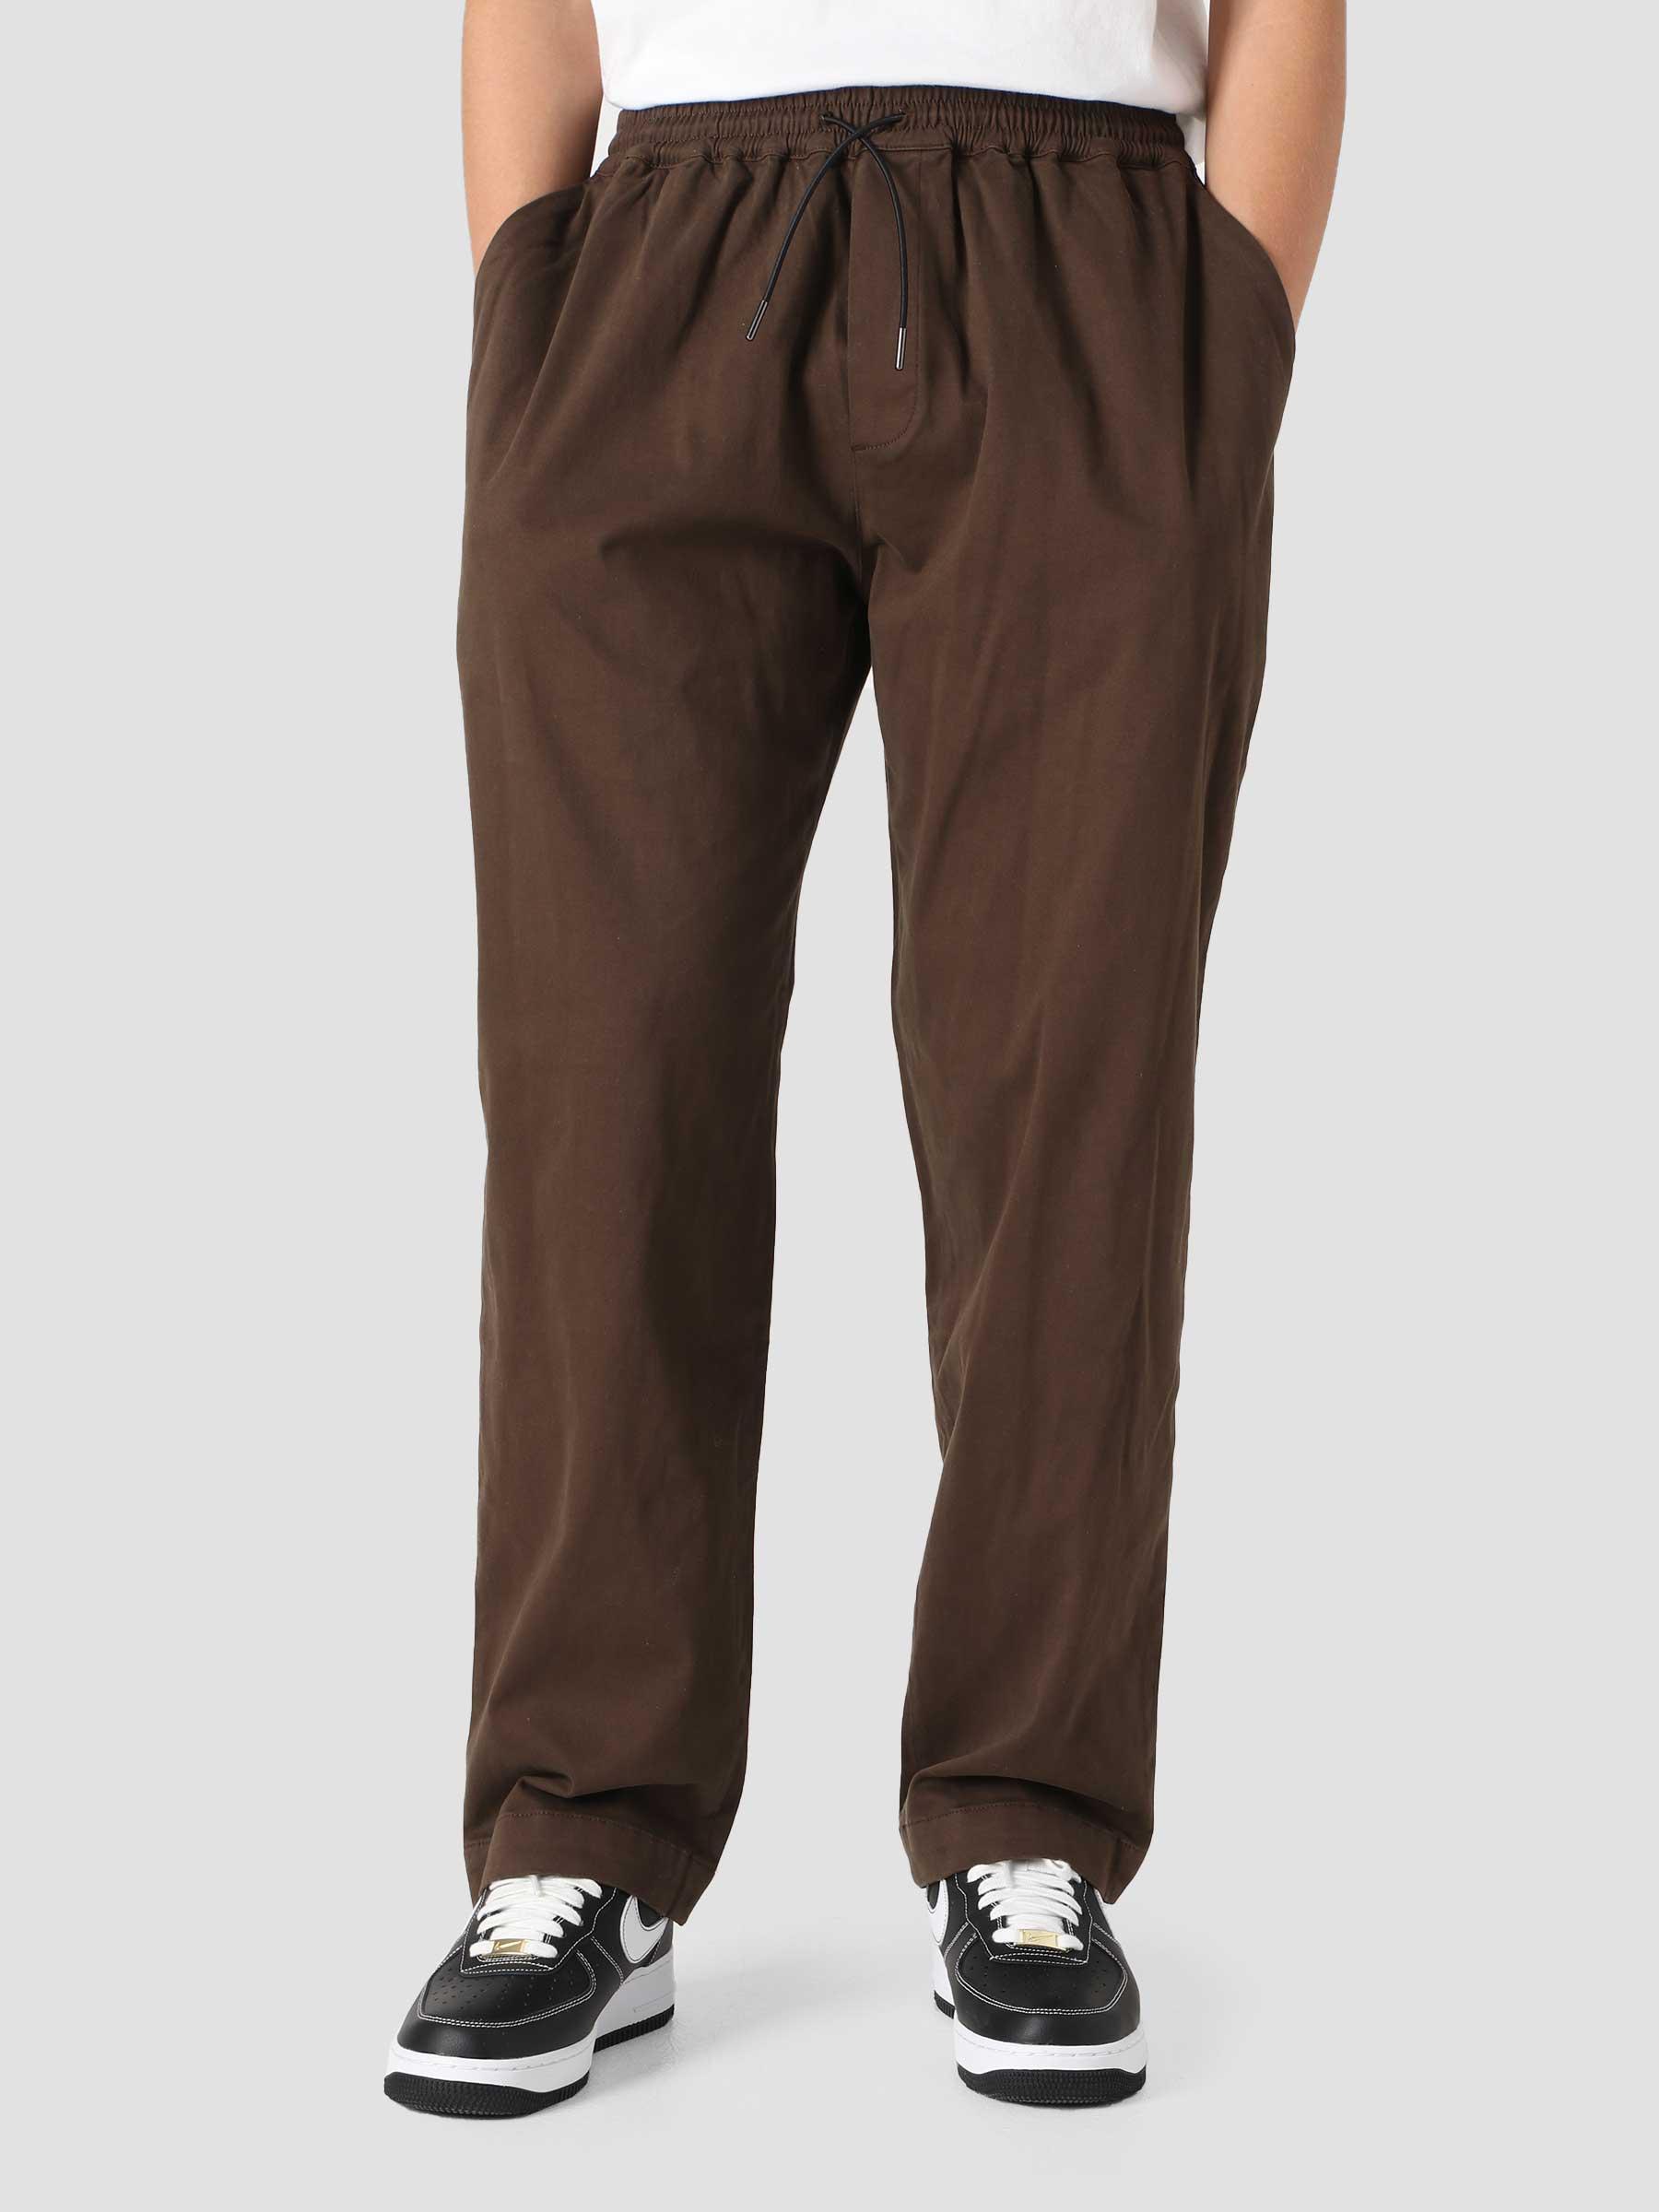 Work Pants Chocolate Brown 2021277